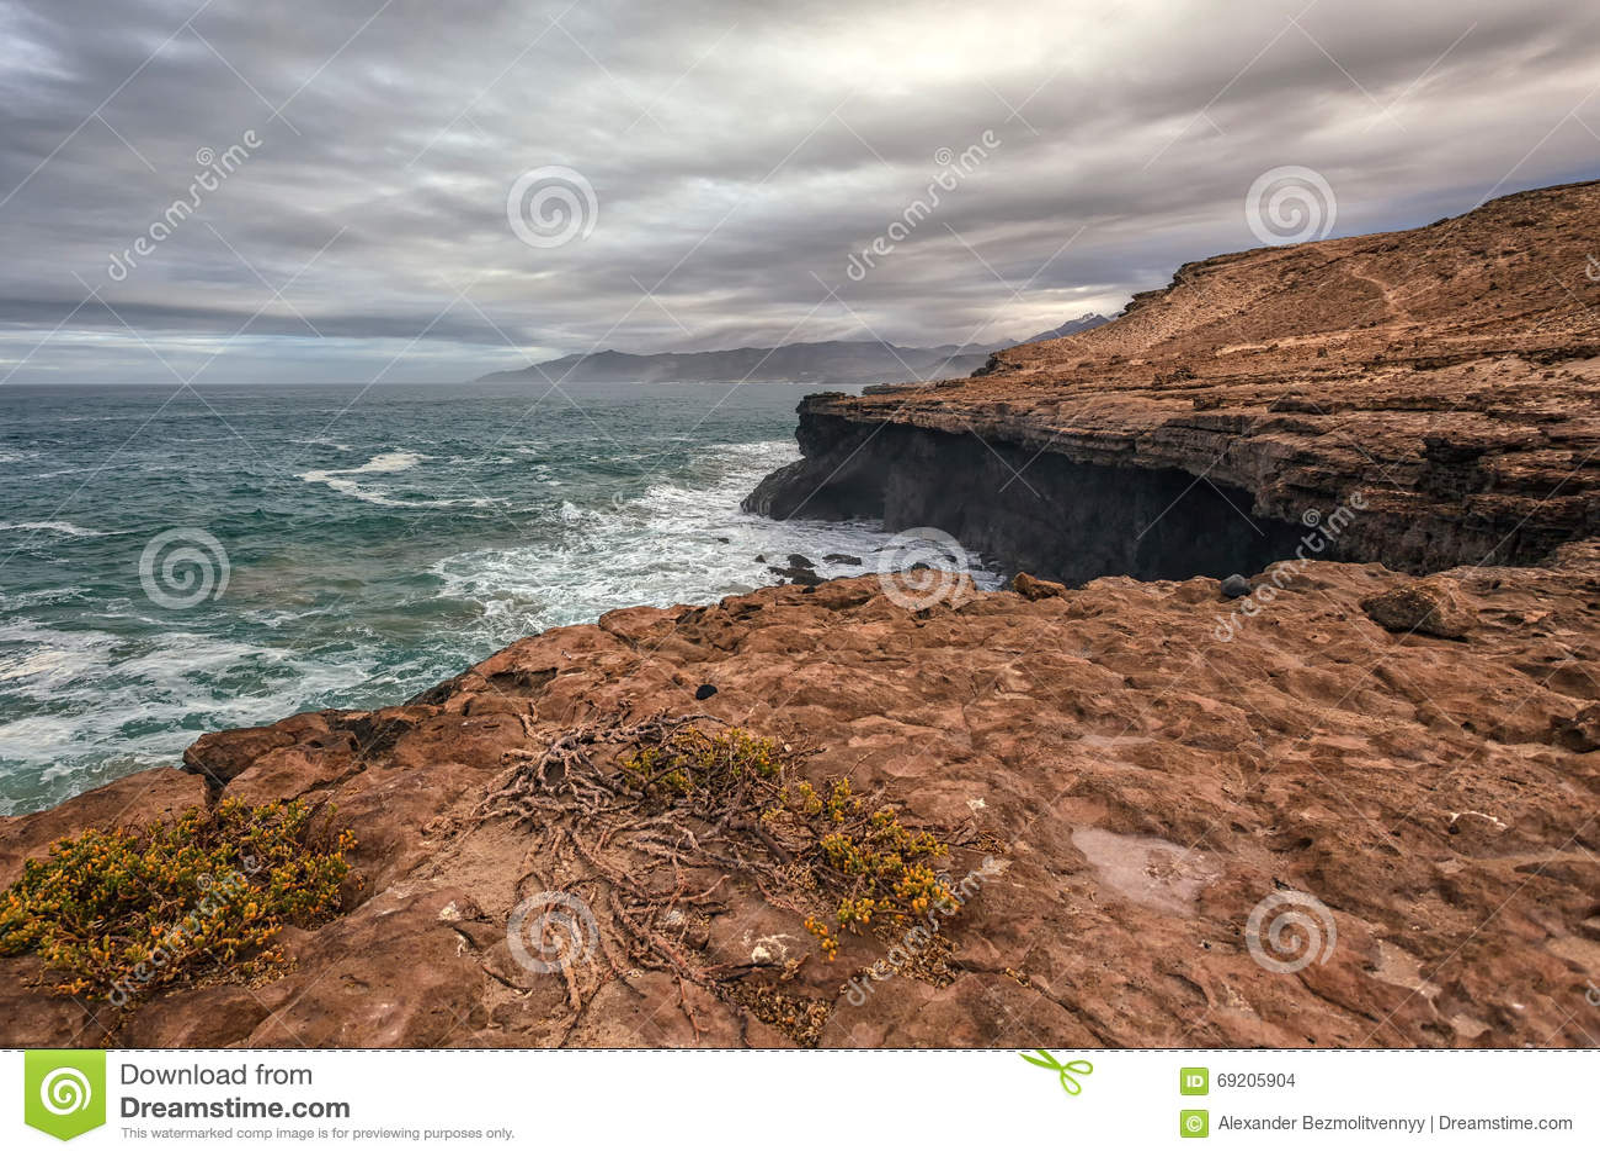 Landscape Design Ventura